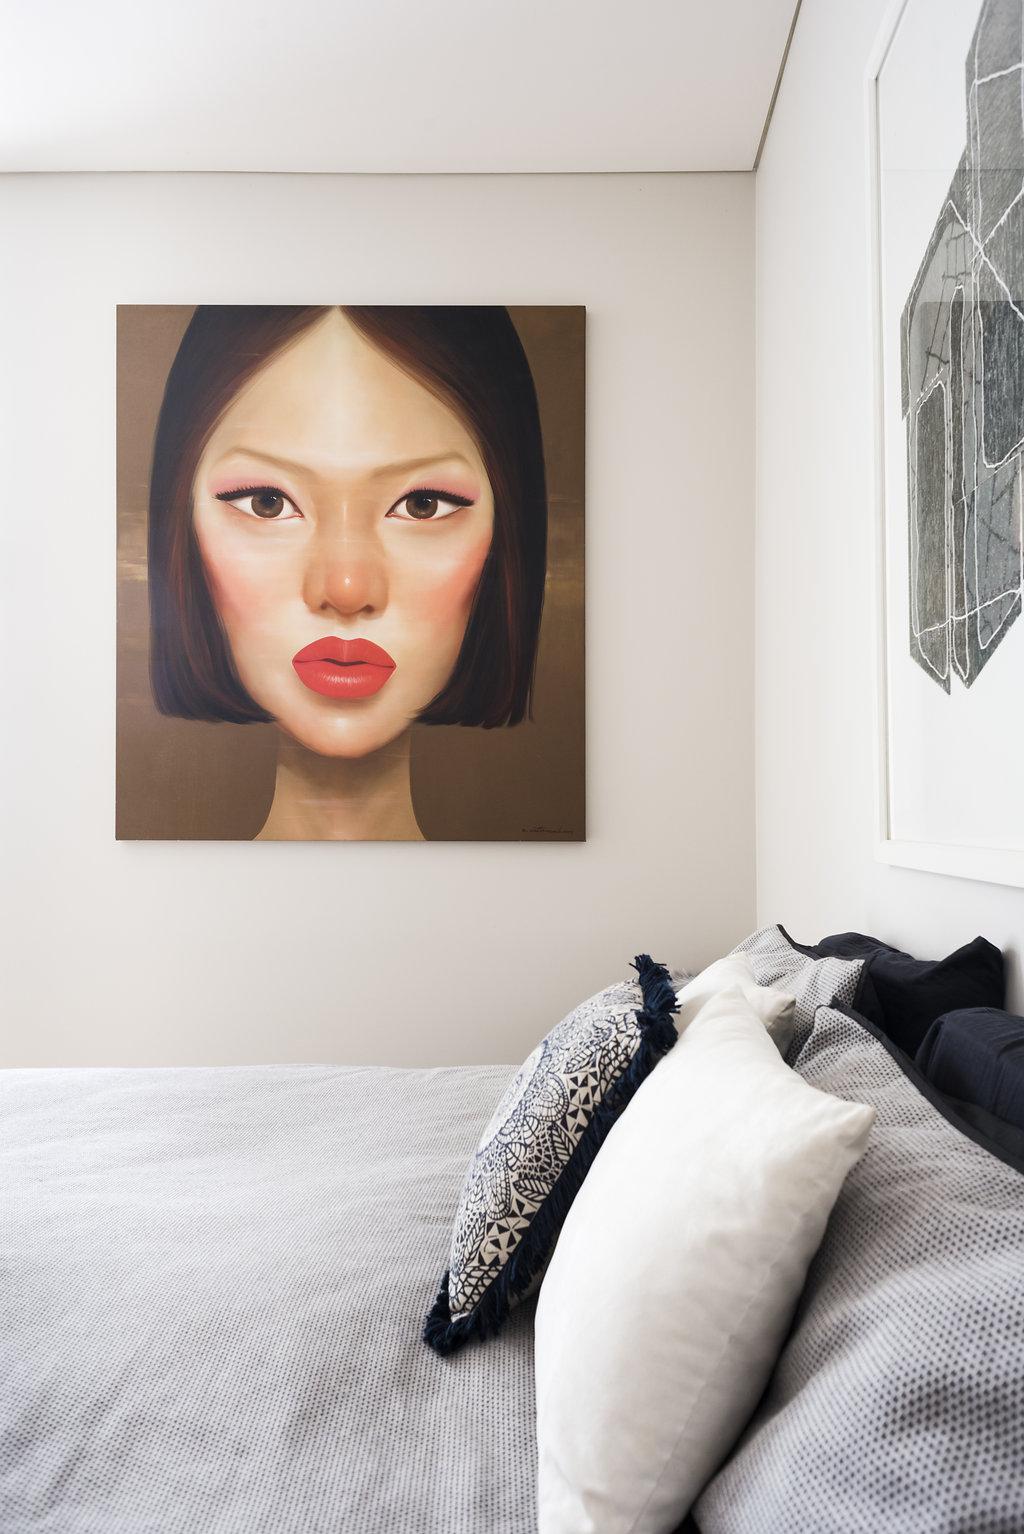 Master Bedroom artwork by Kowit Wattanarach